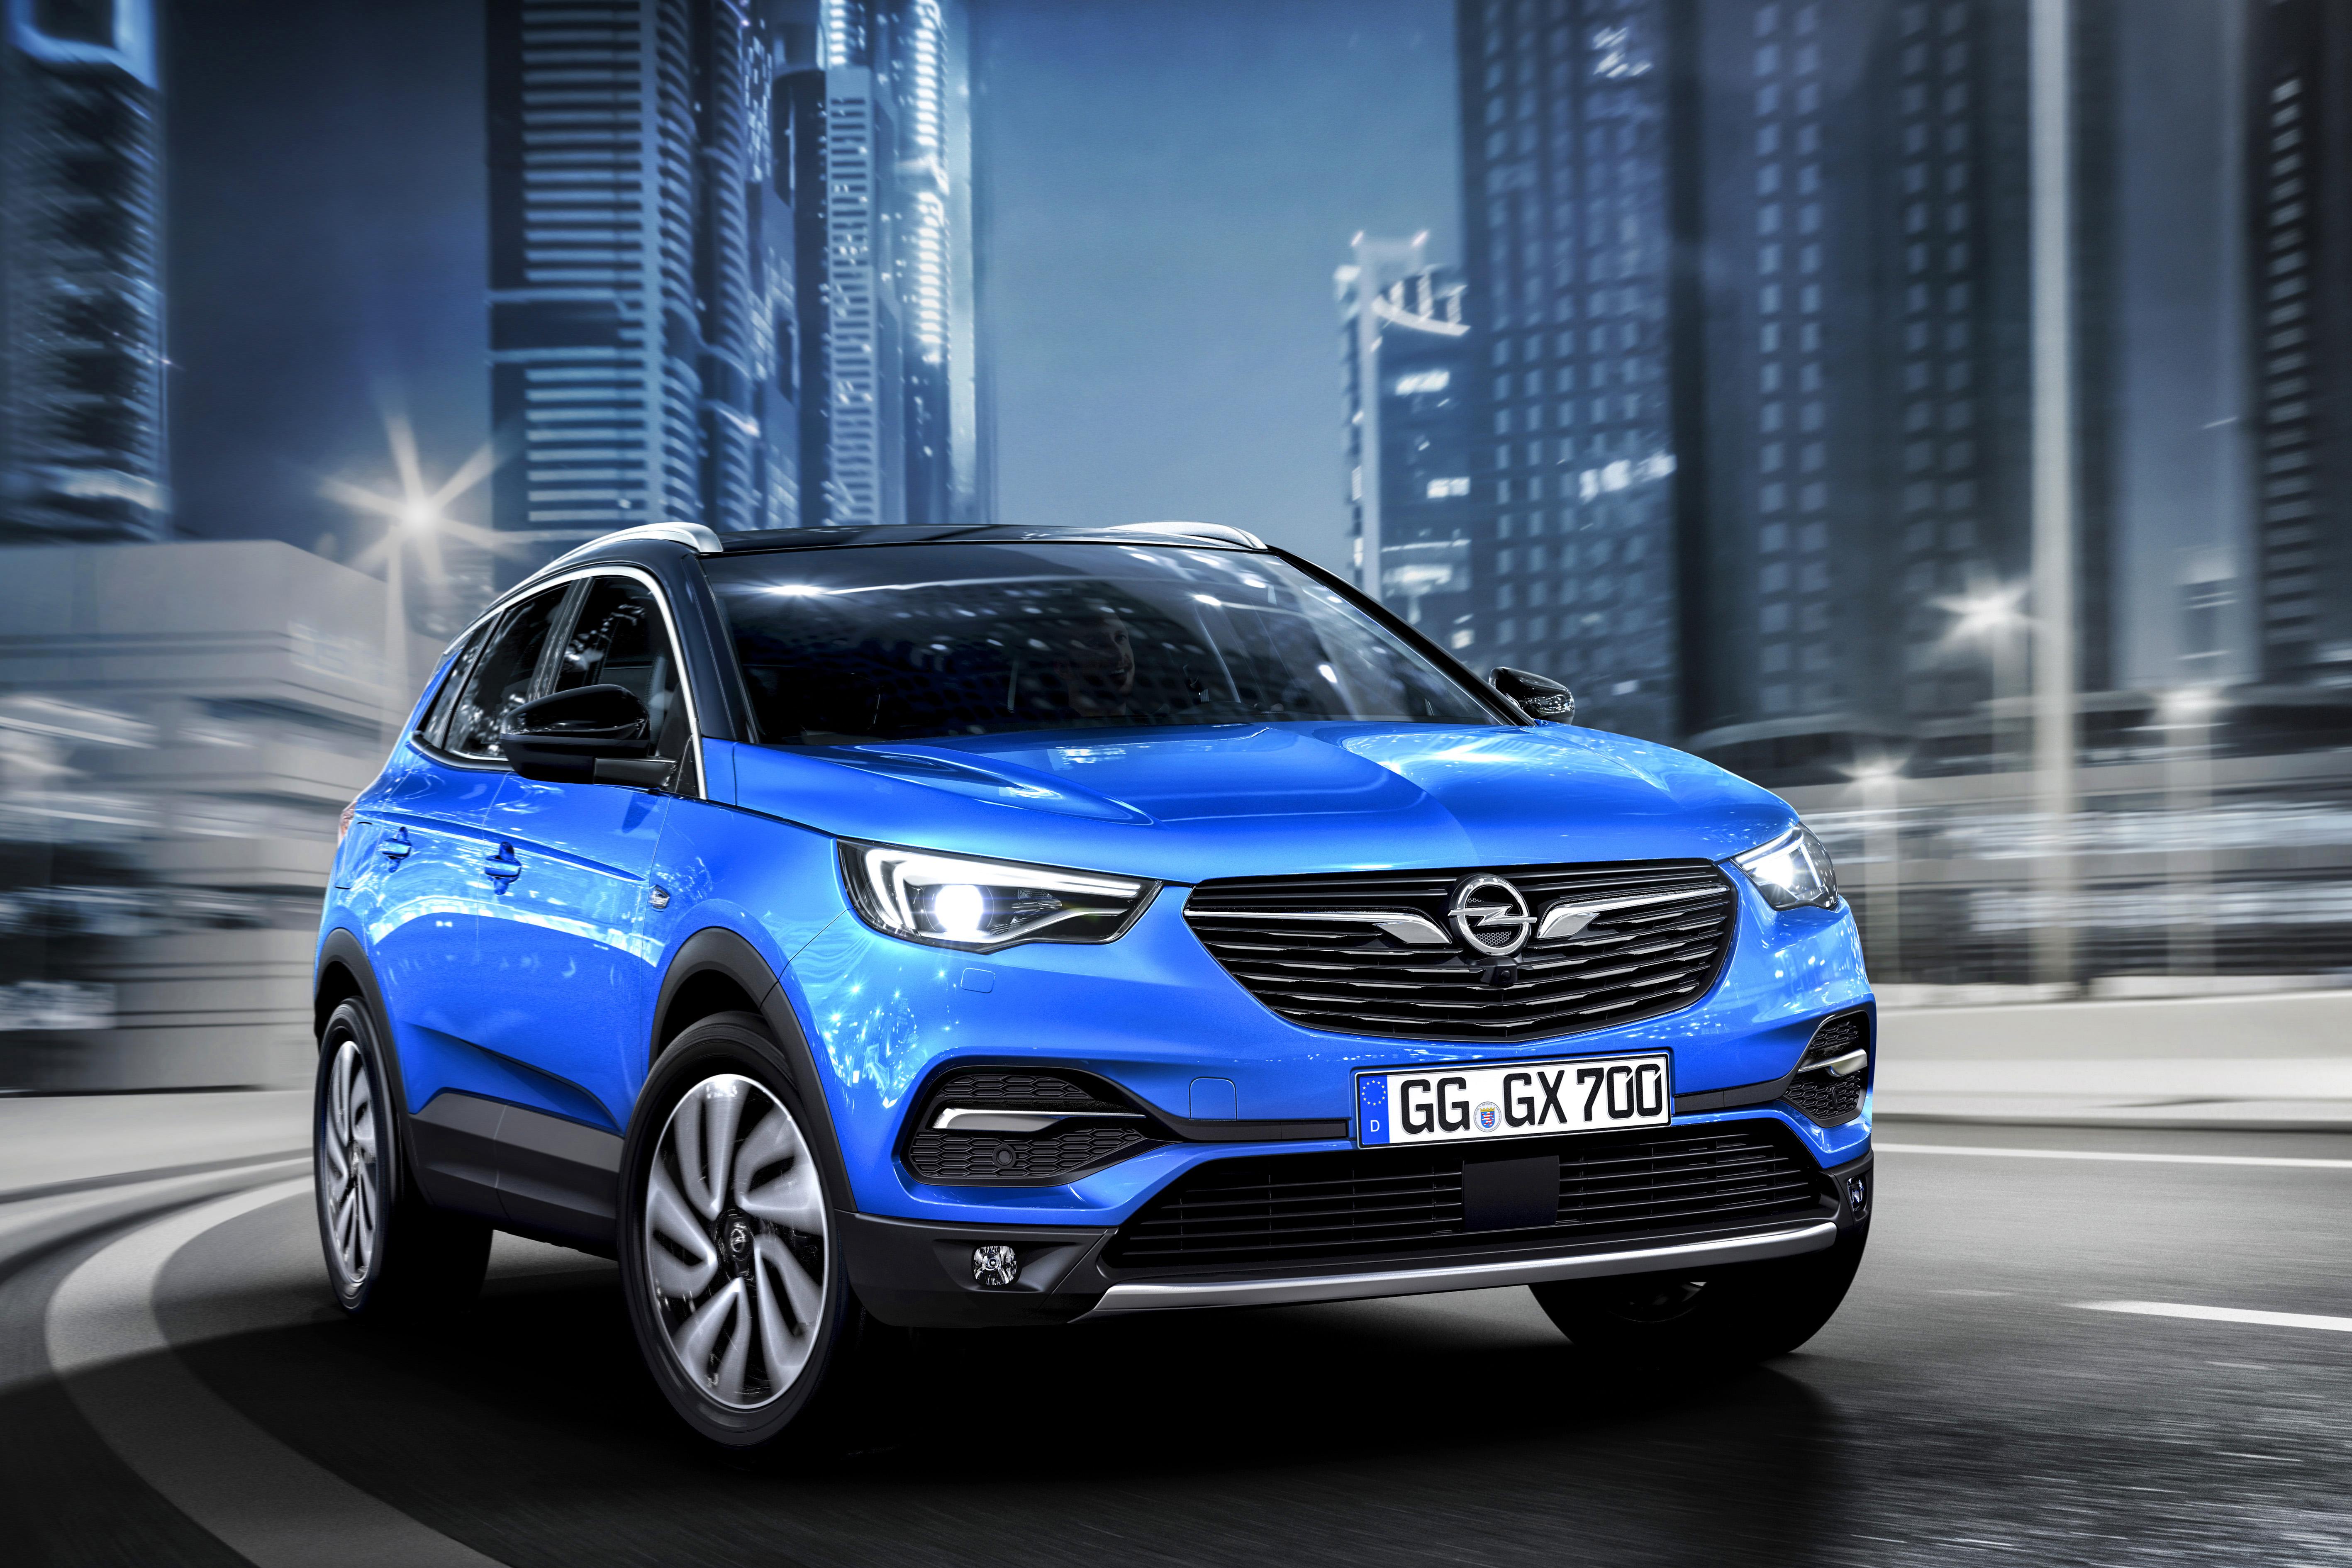 Opel >> The New Suv Athletic And Adventurous Opel Grandland X